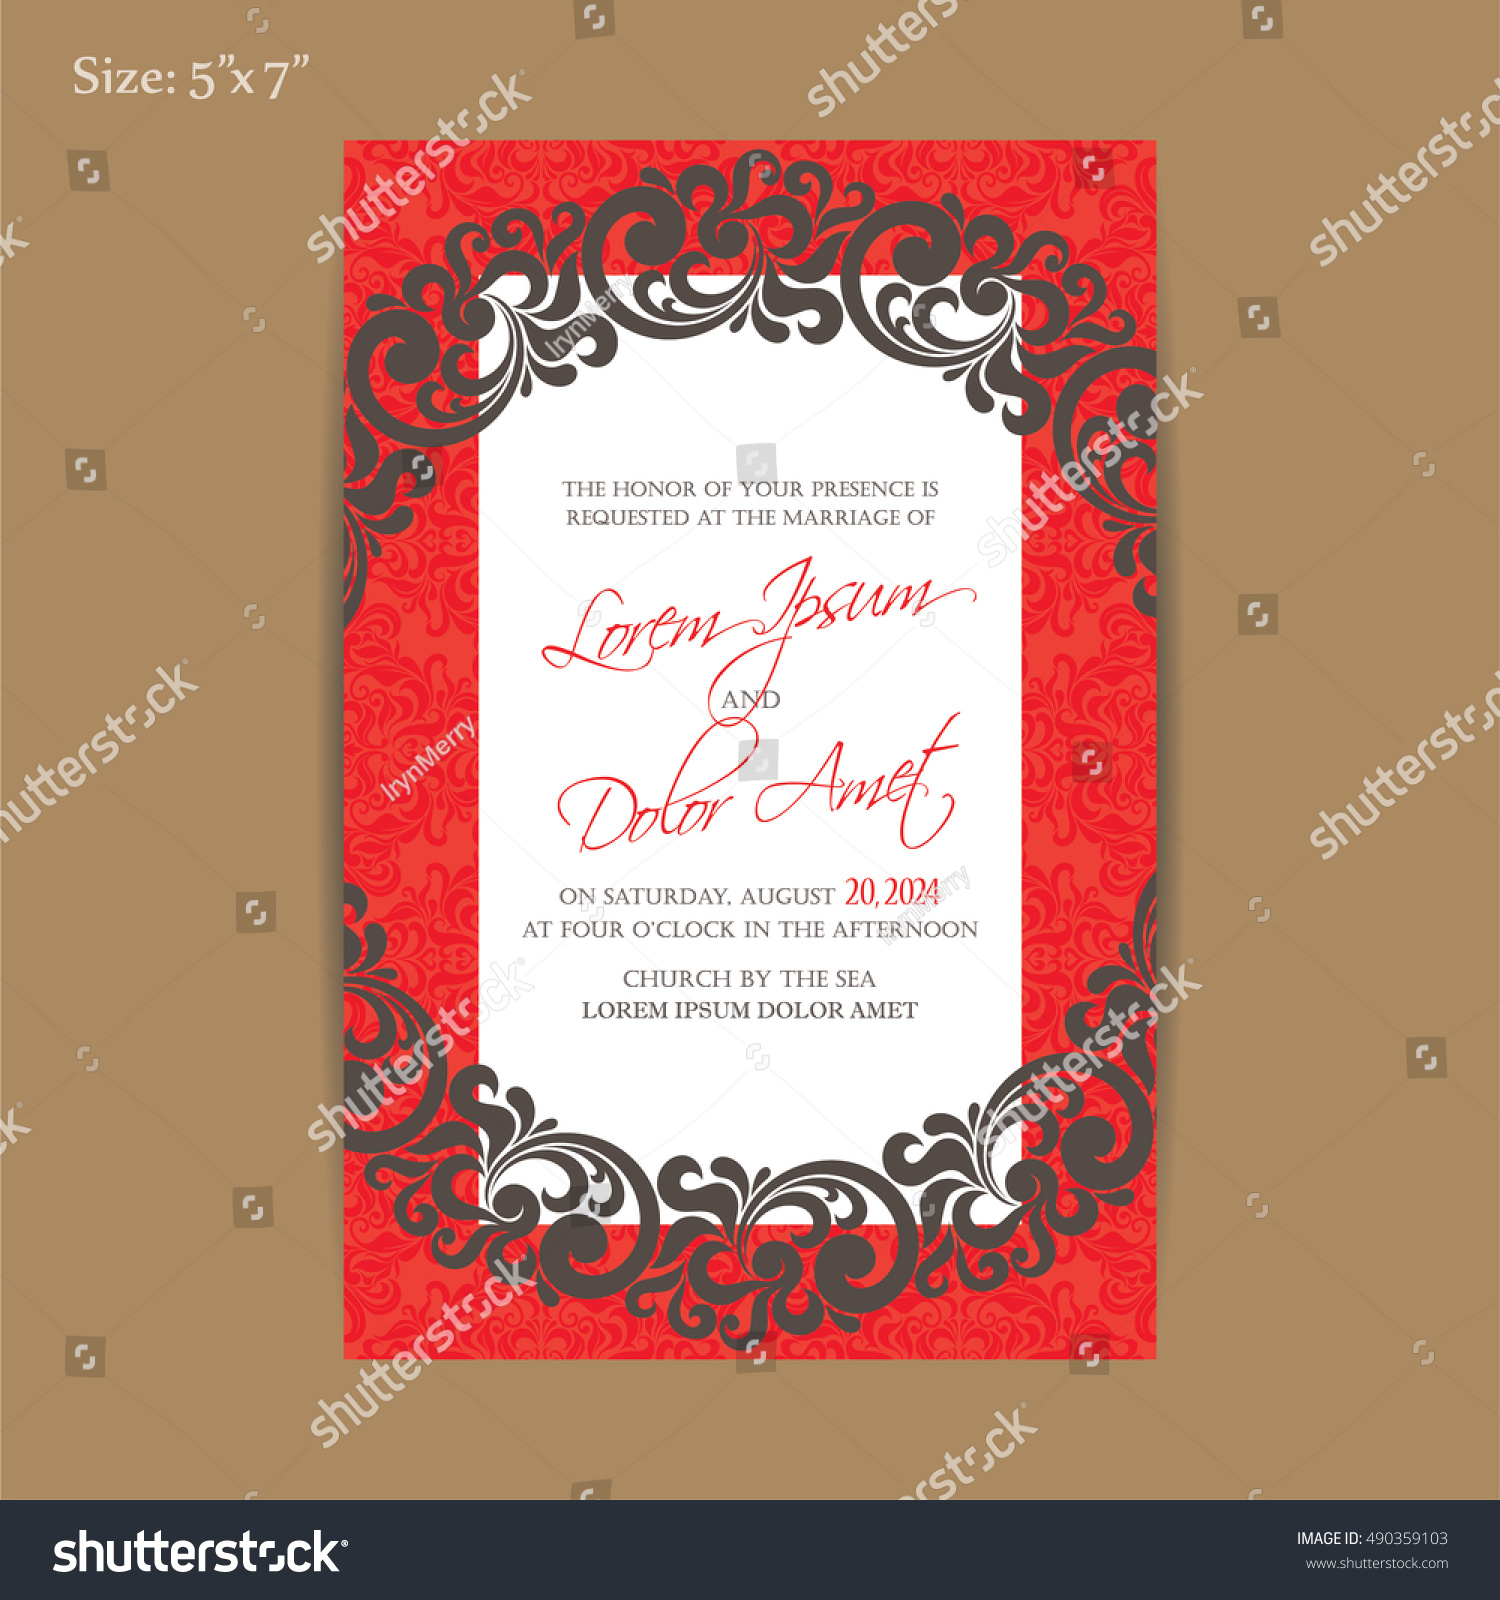 Luxury Red Vintage Wedding Invitation Card Stock Vector (Royalty ...